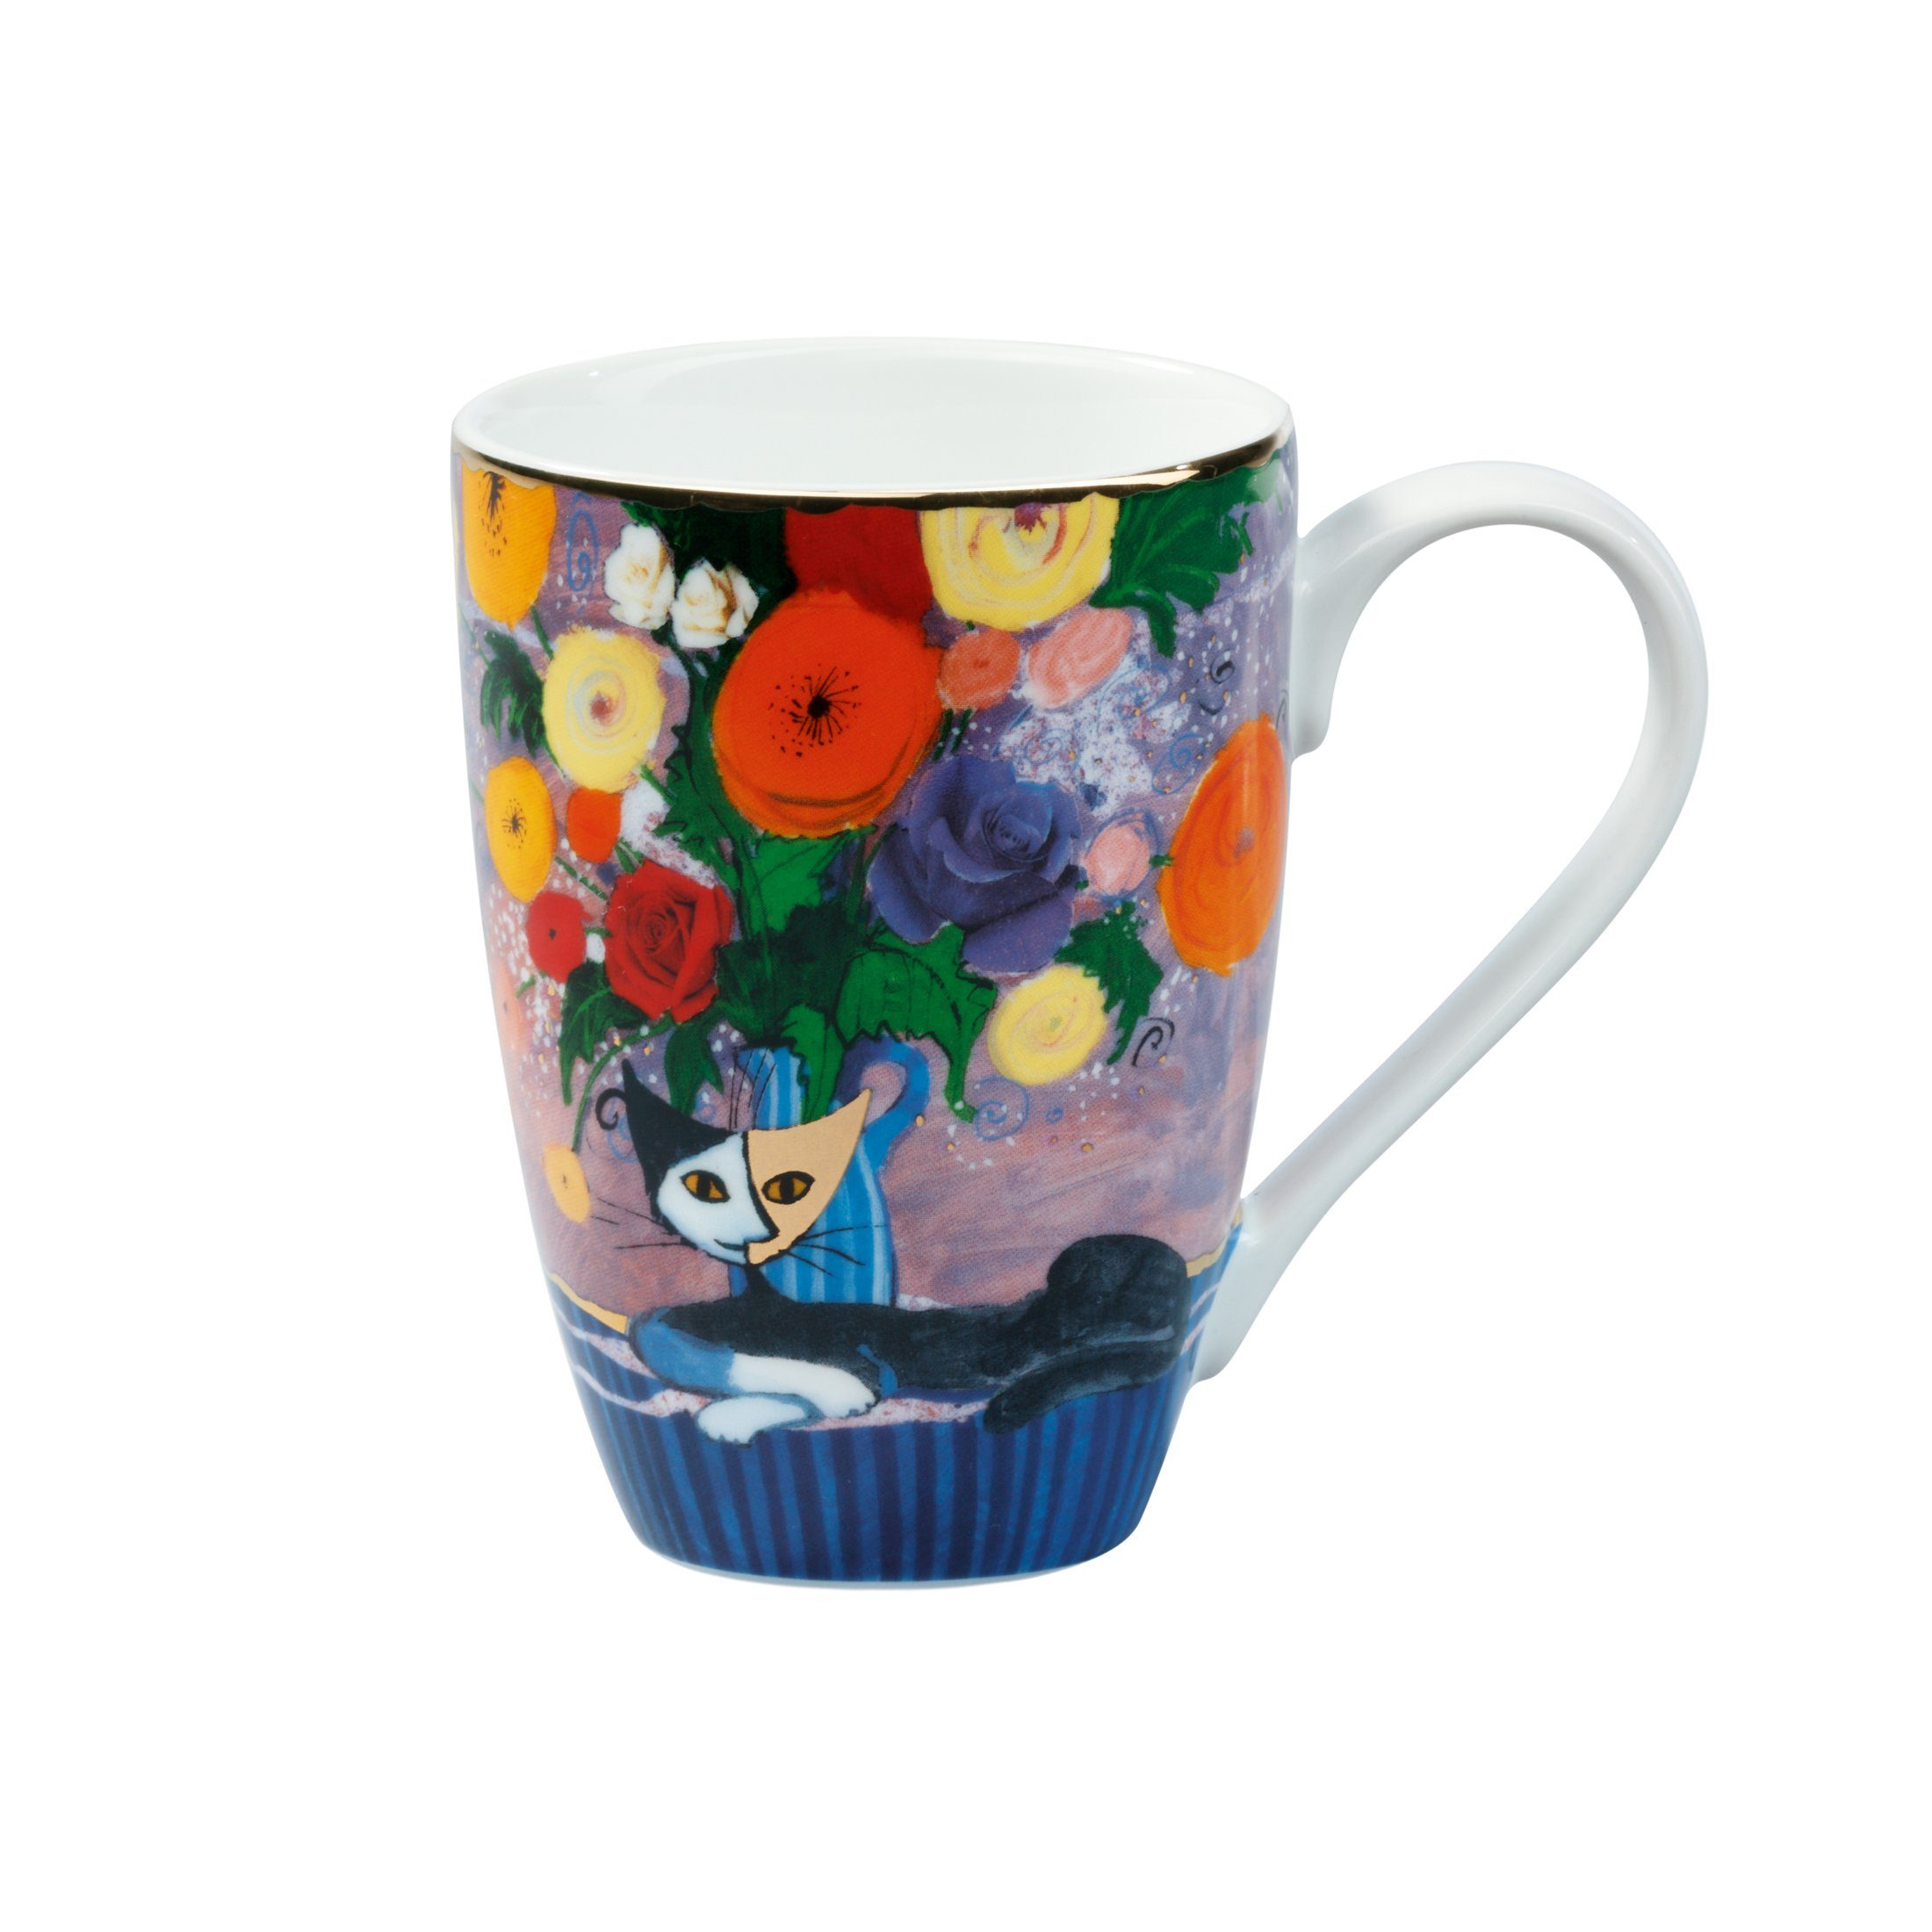 Goebel Innamorato Kaffeebecher »Rosina Wachtmeister«